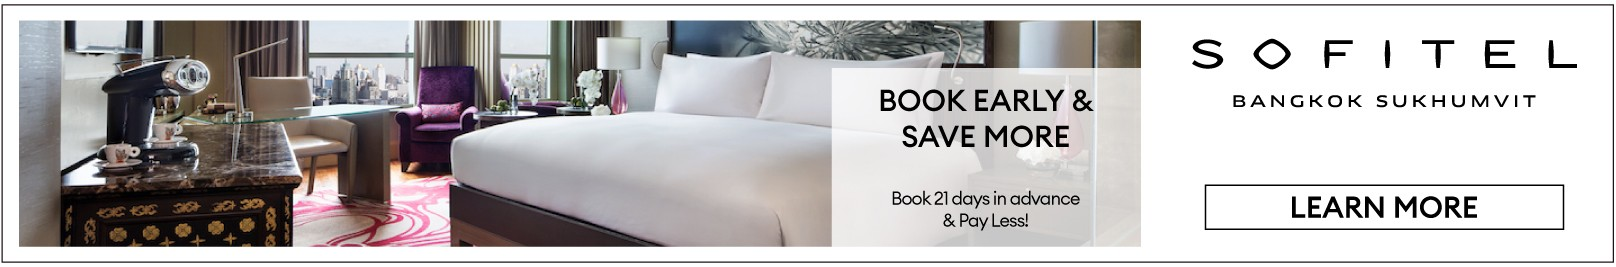 advance saver offer